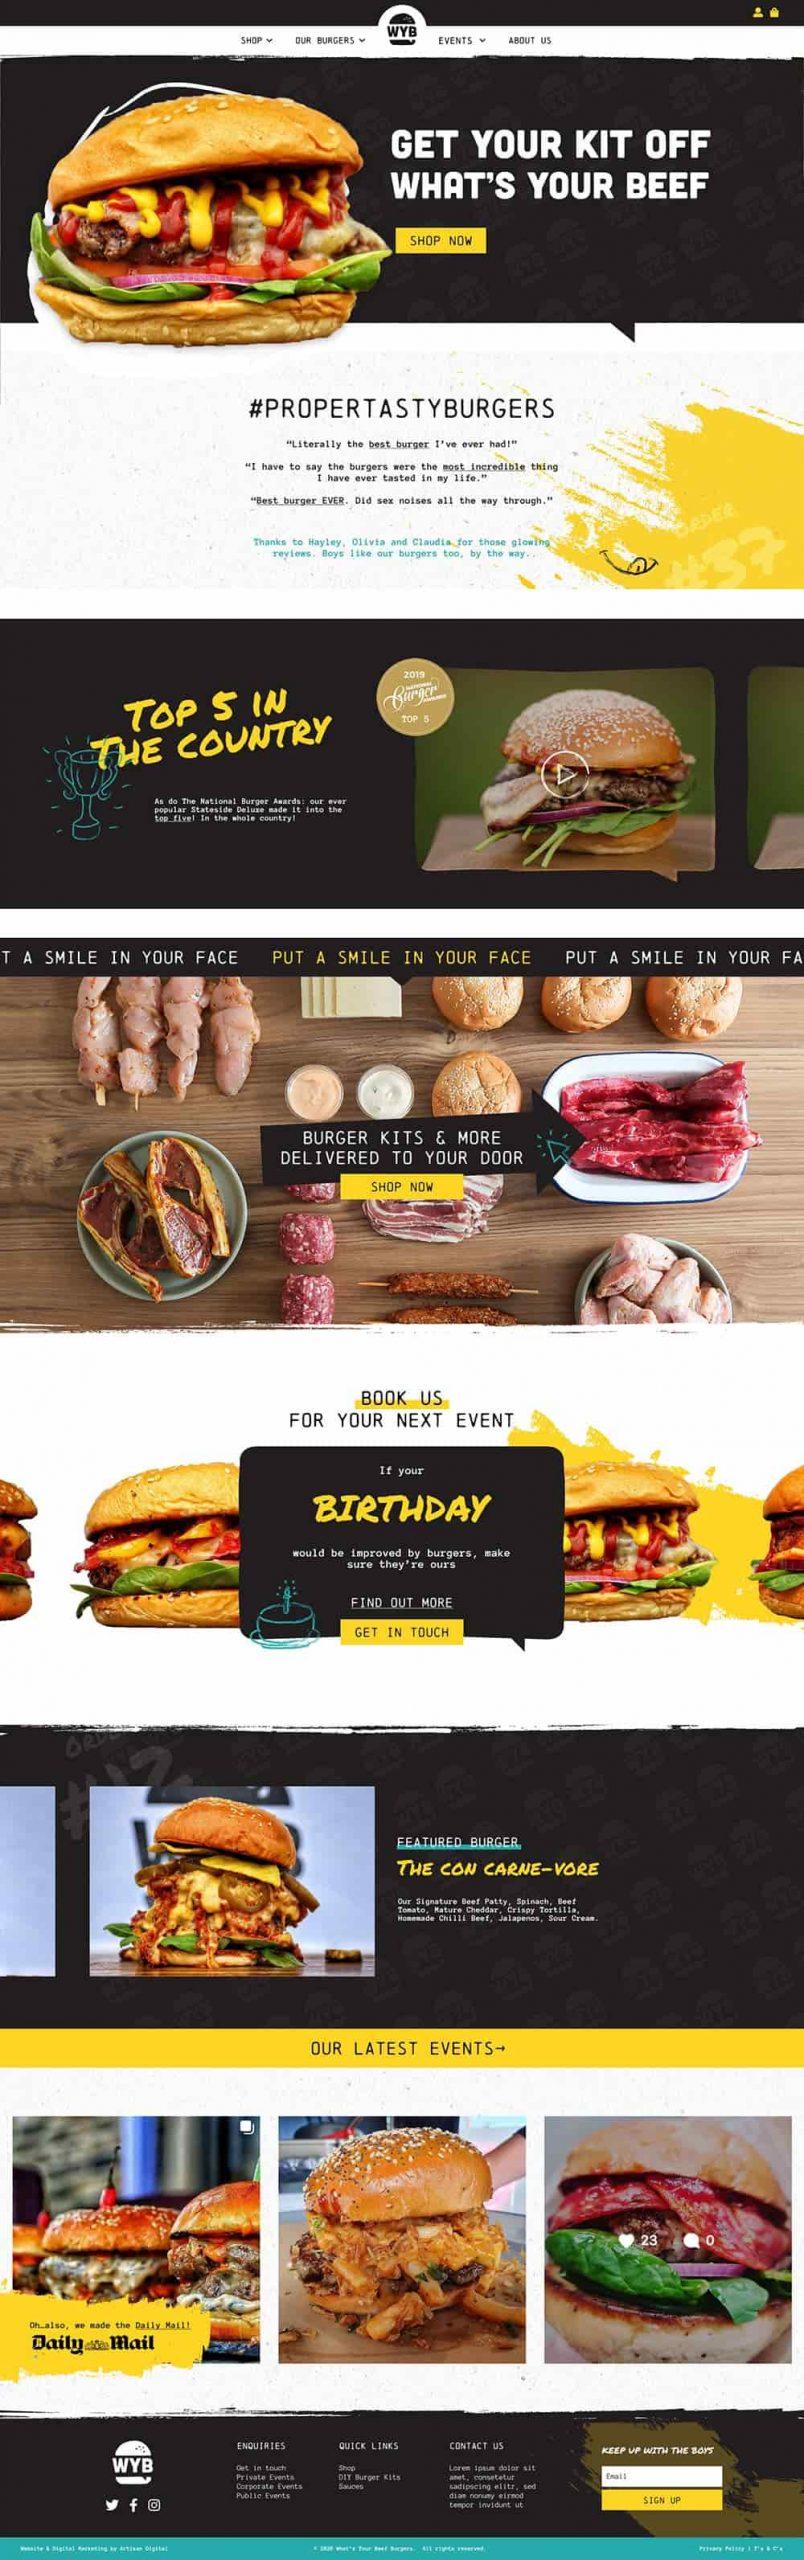 Homepage_WYBB-min